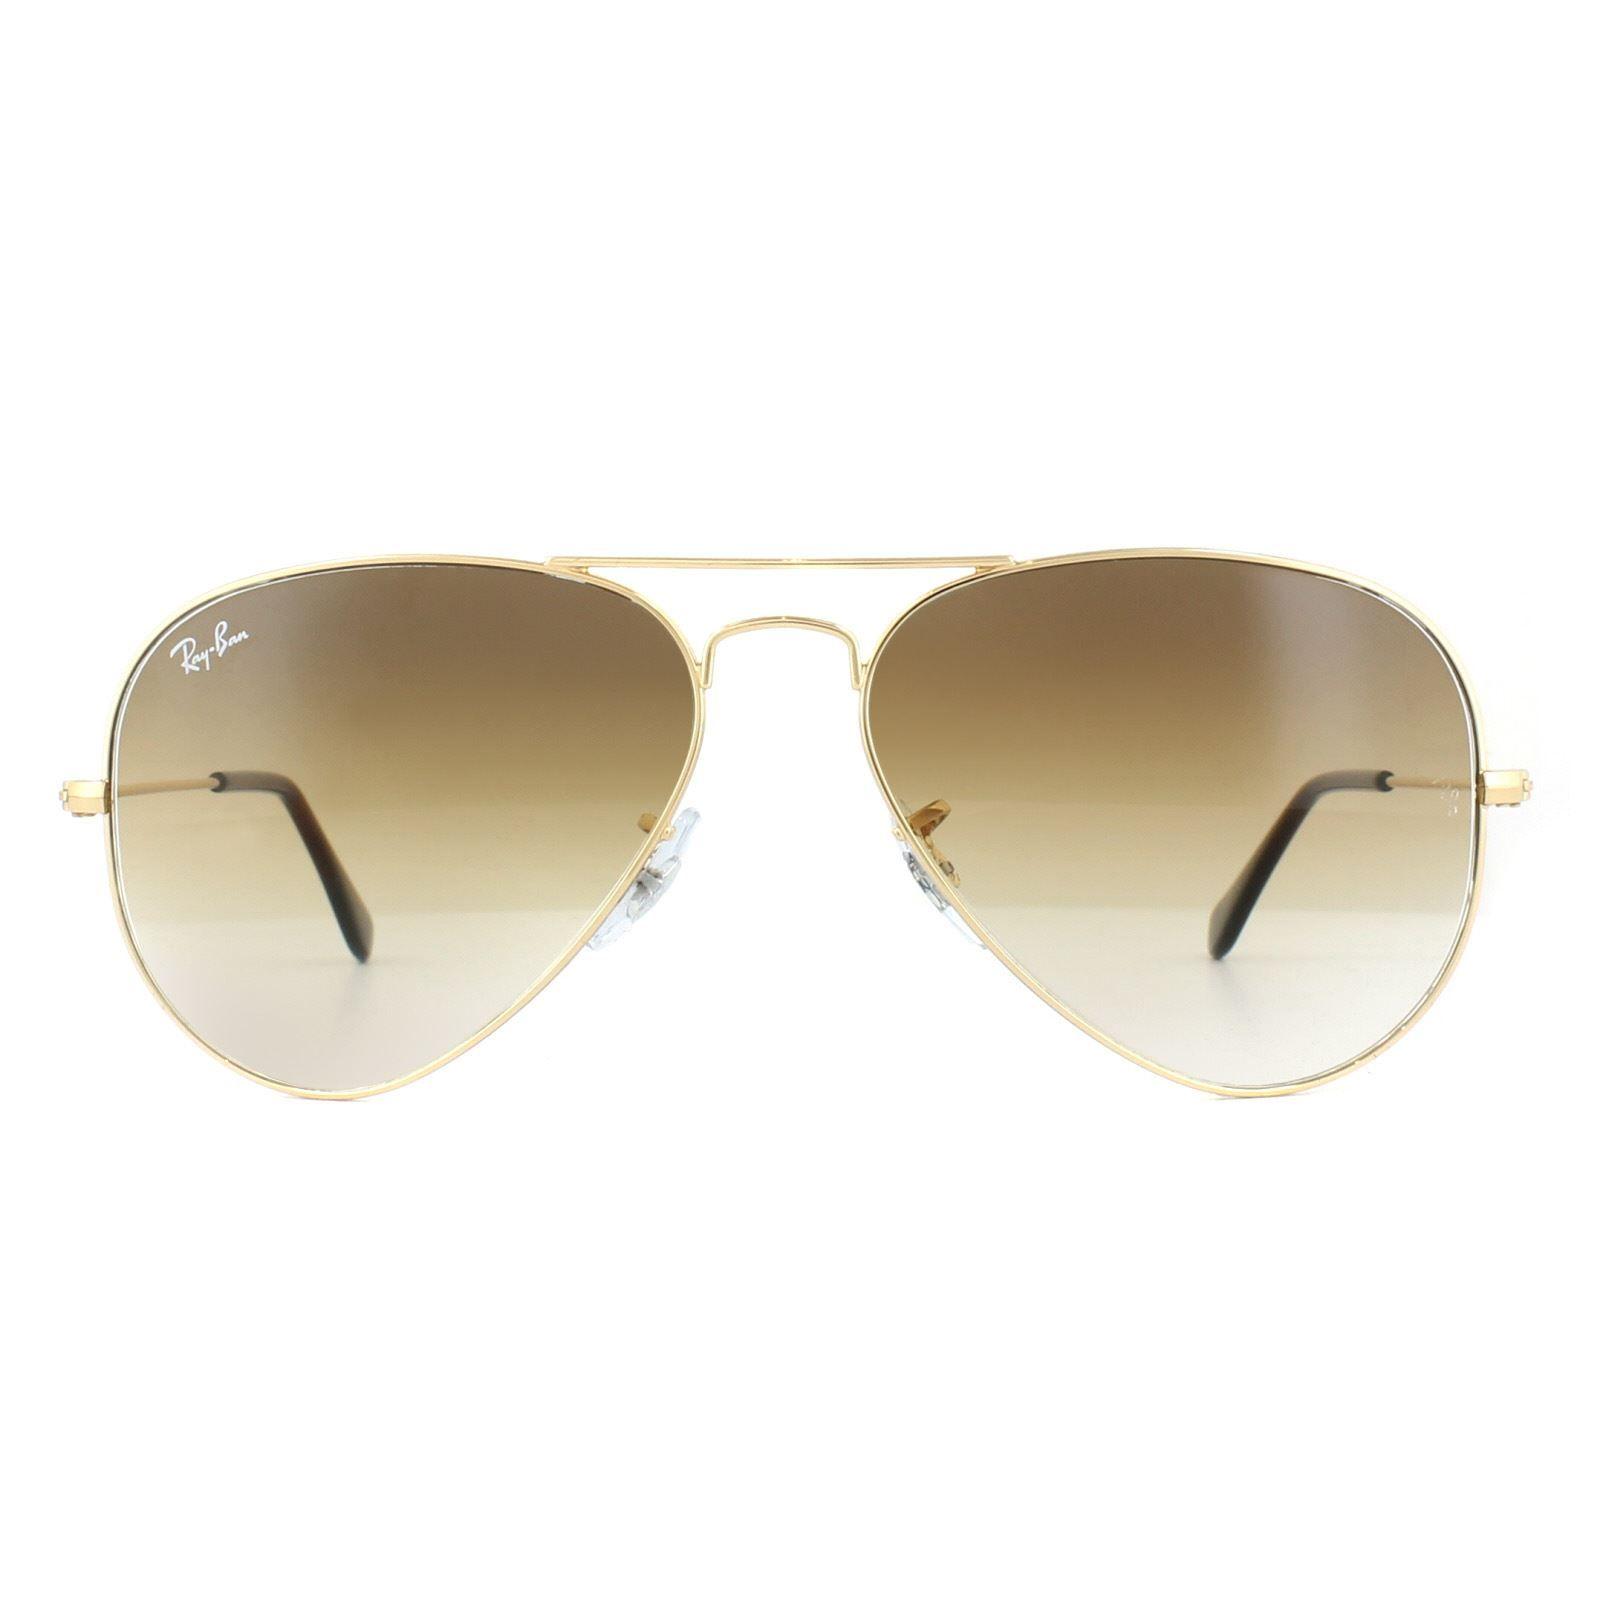 Ray-Ban Sunglasses Aviator 3025 001/51 Gold Brown Shade